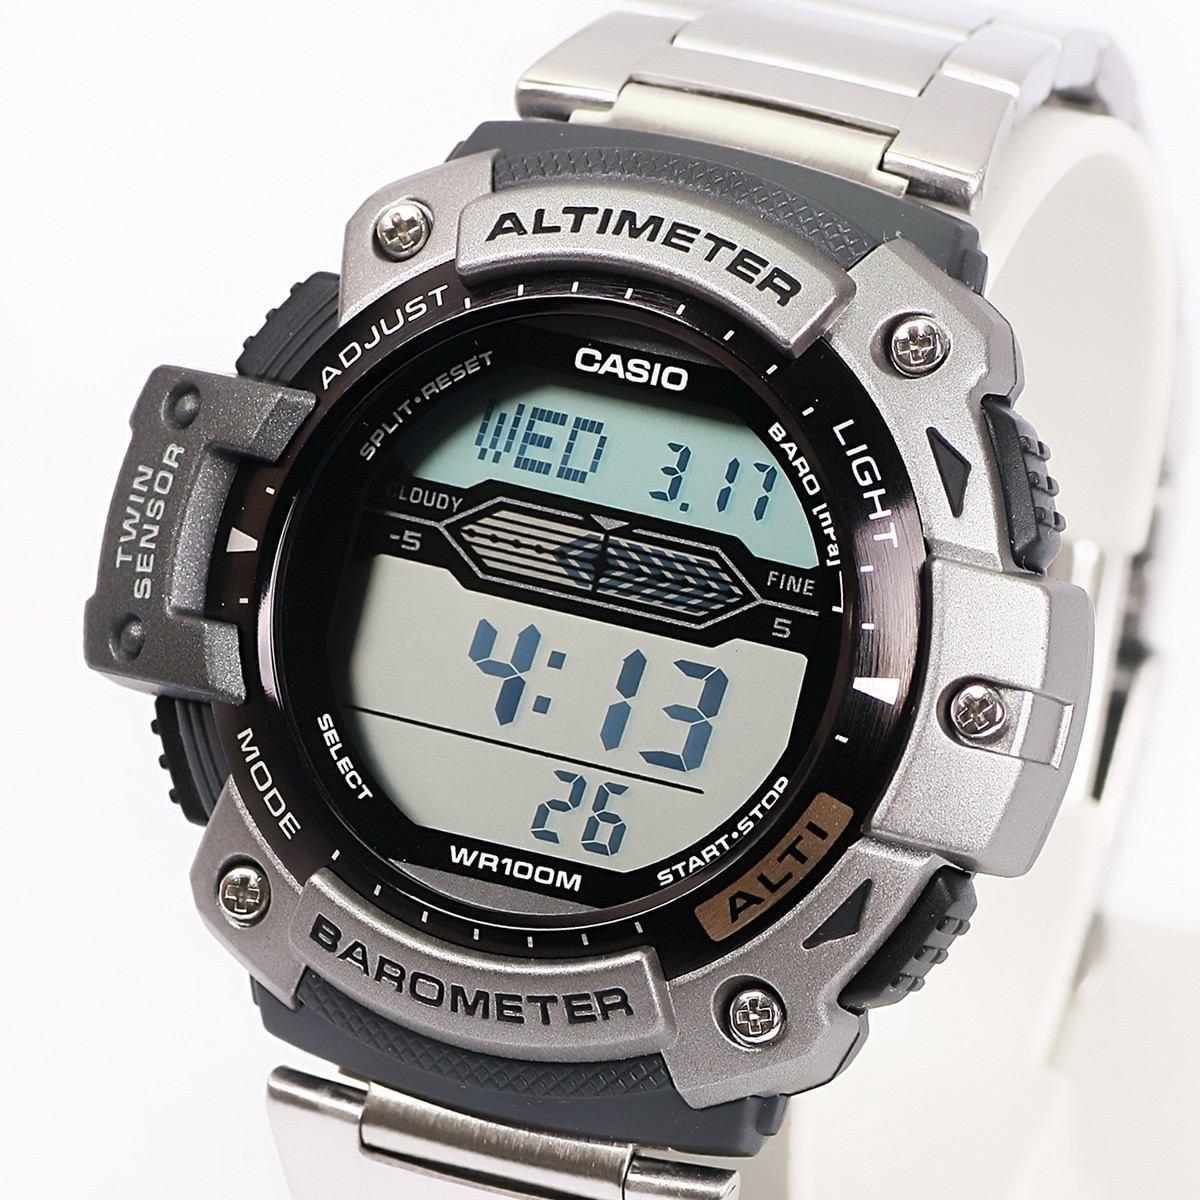 Y Sgw AltimetroBarometro Reloj Termometro Casio 300h eYH92IEWD